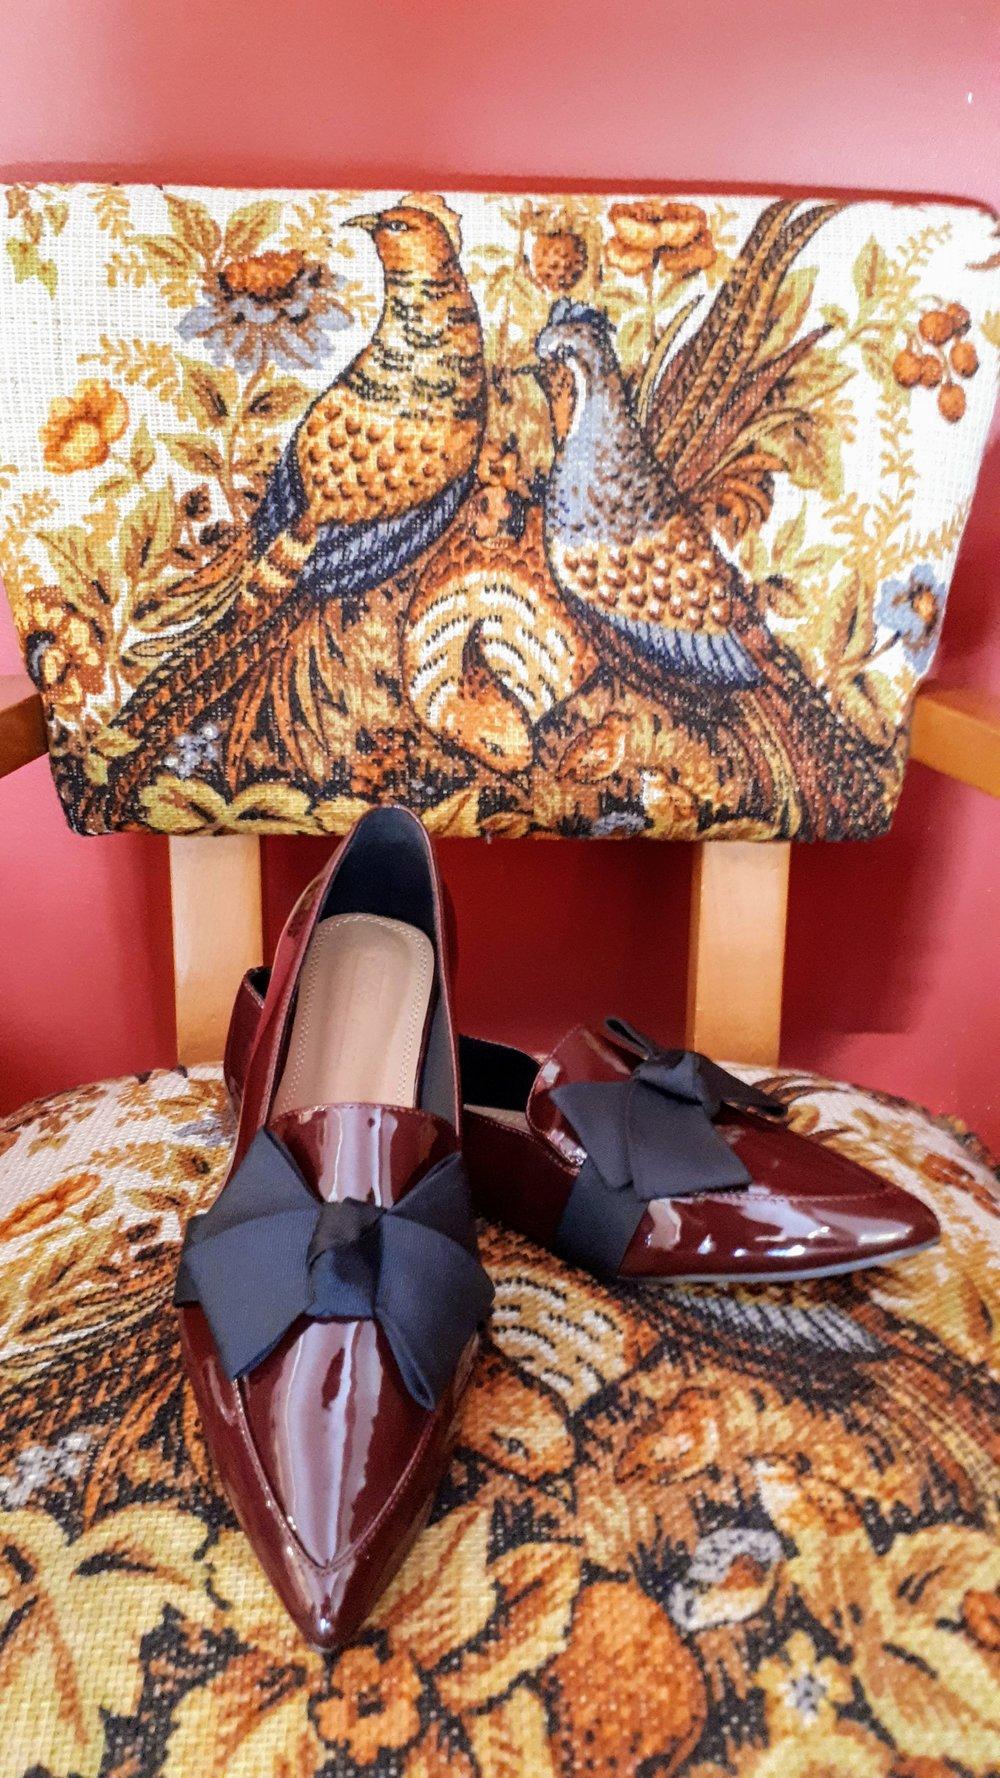 ASOS shoes; S9, $32